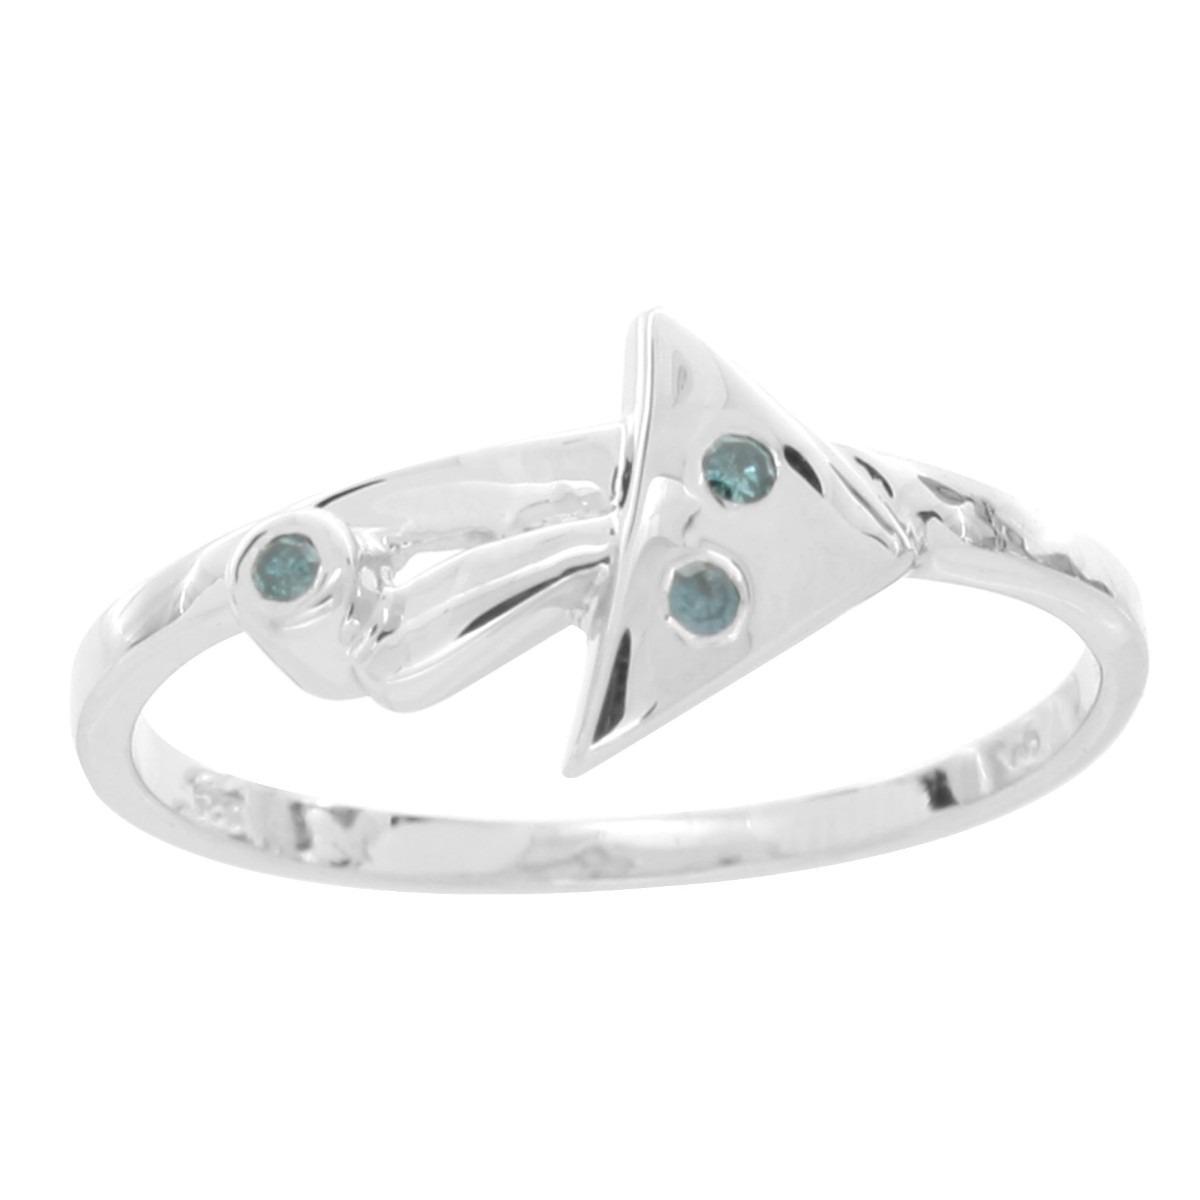 Anillo De Compromiso De Plata Y Platino Con Diamantes # 8